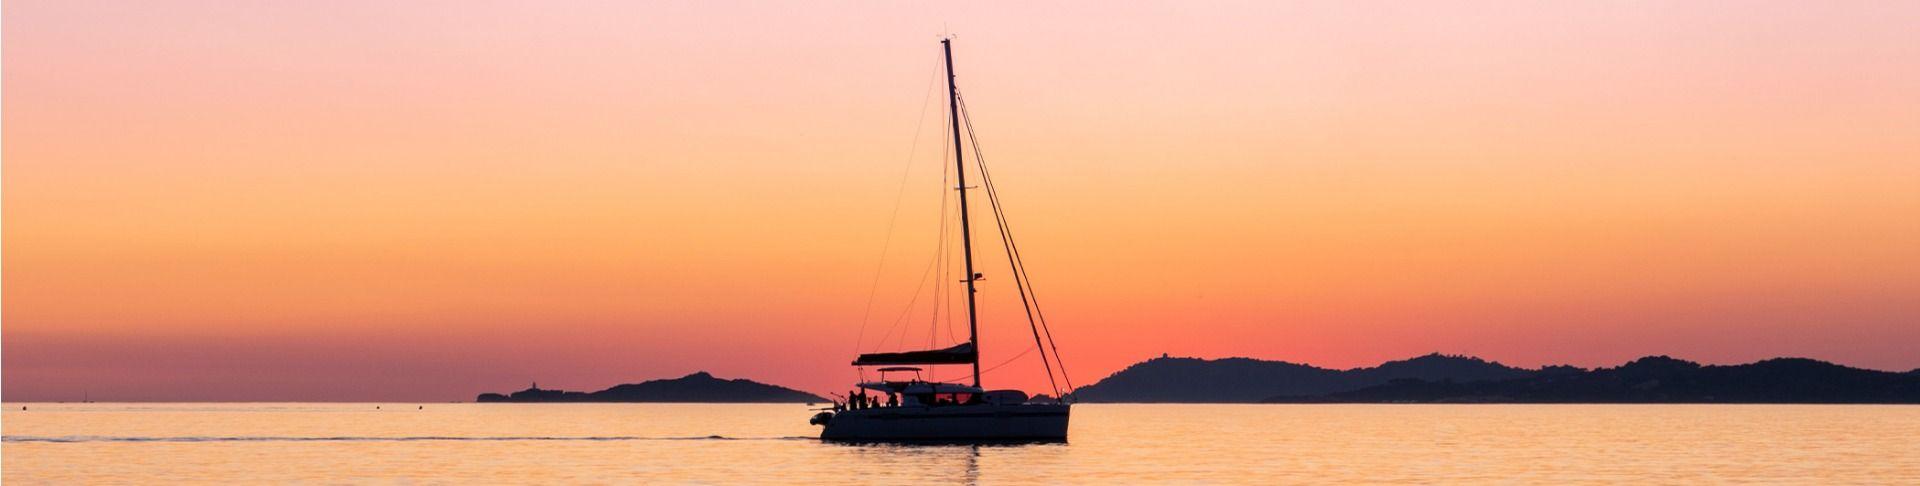 /f/e-learning-pratique-bateau-a-voile